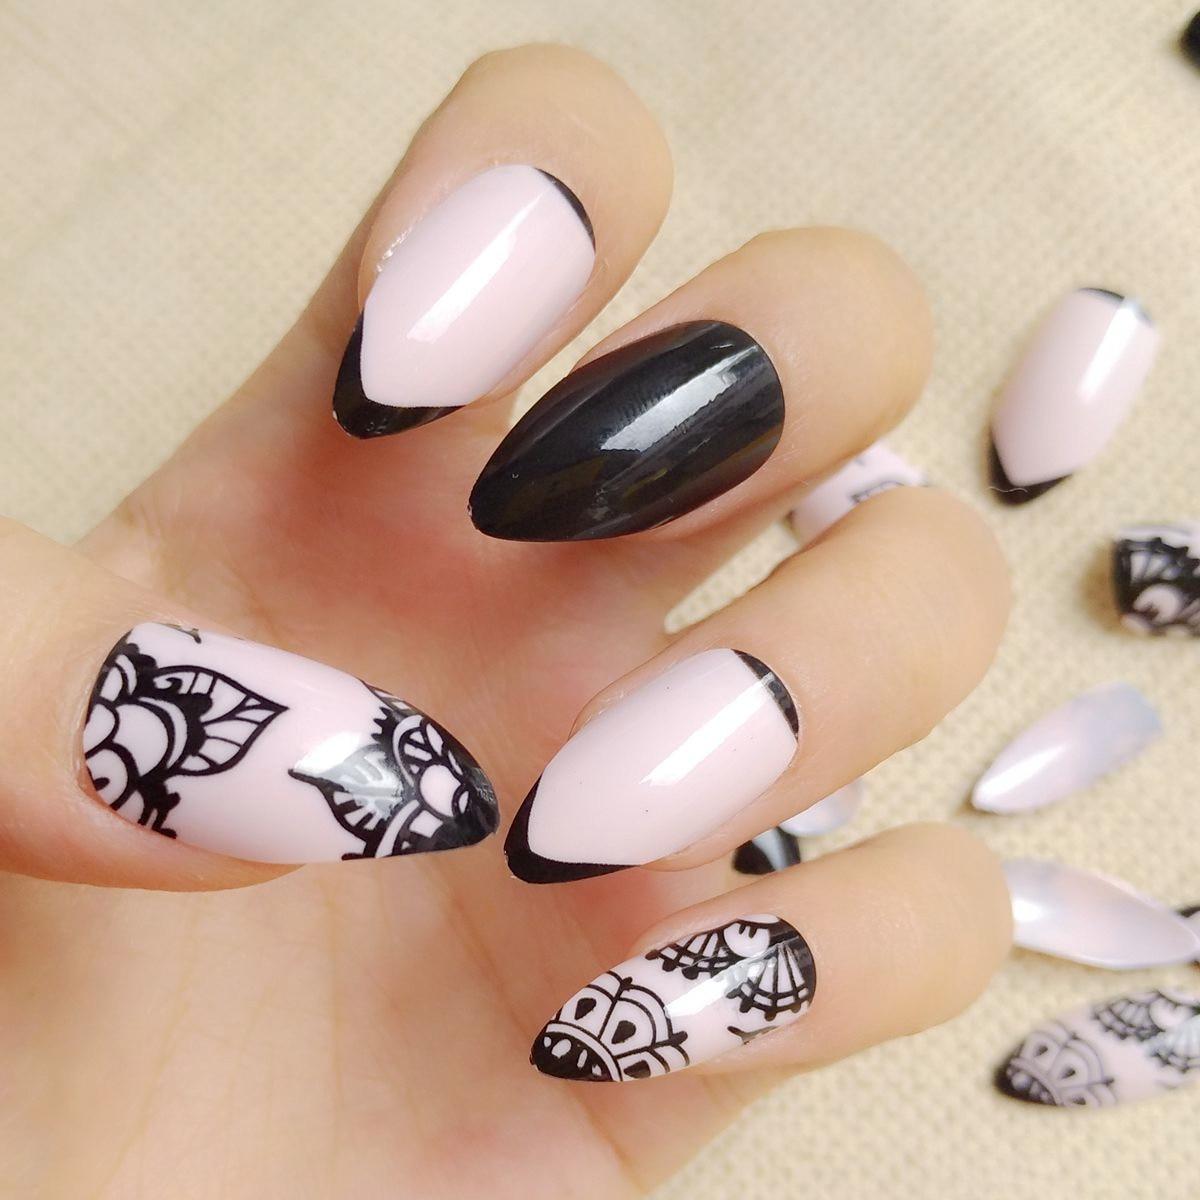 24Pcs Shiny Black Fake Nail Short Stiletto Nails Natural French ...